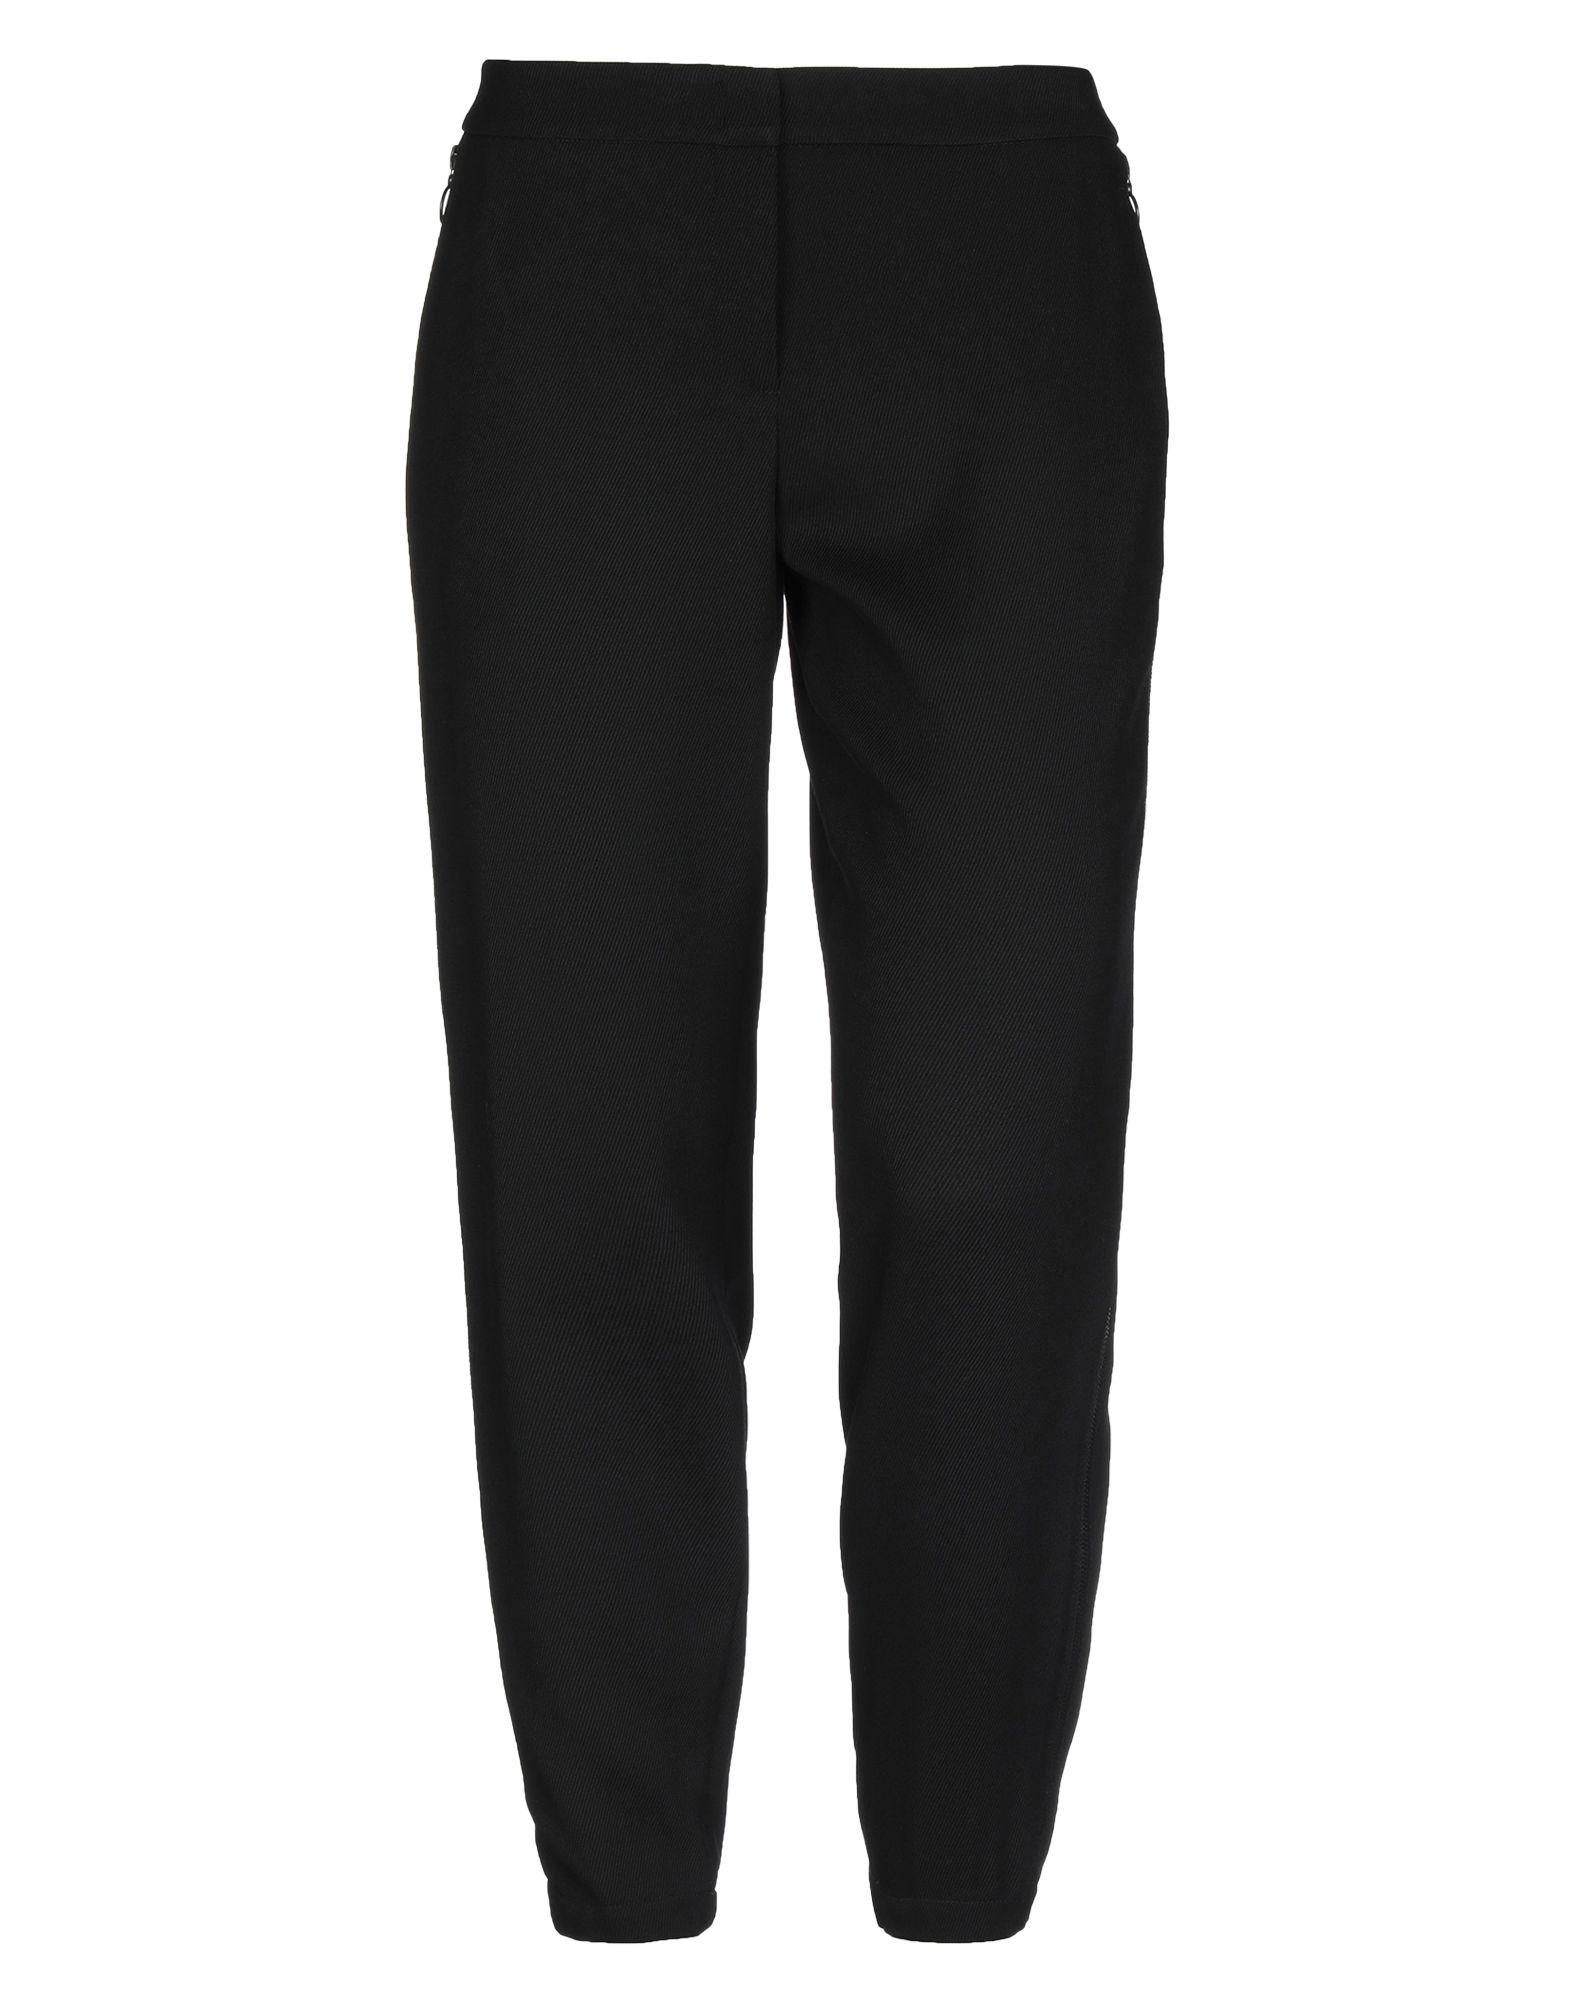 AKRIS PUNTO Casual pants. plain weave, no appliqués, basic solid color, mid rise, regular fit, tapered leg, hook-and-bar, zip, multipockets. 60% Acetate, 40% Viscose